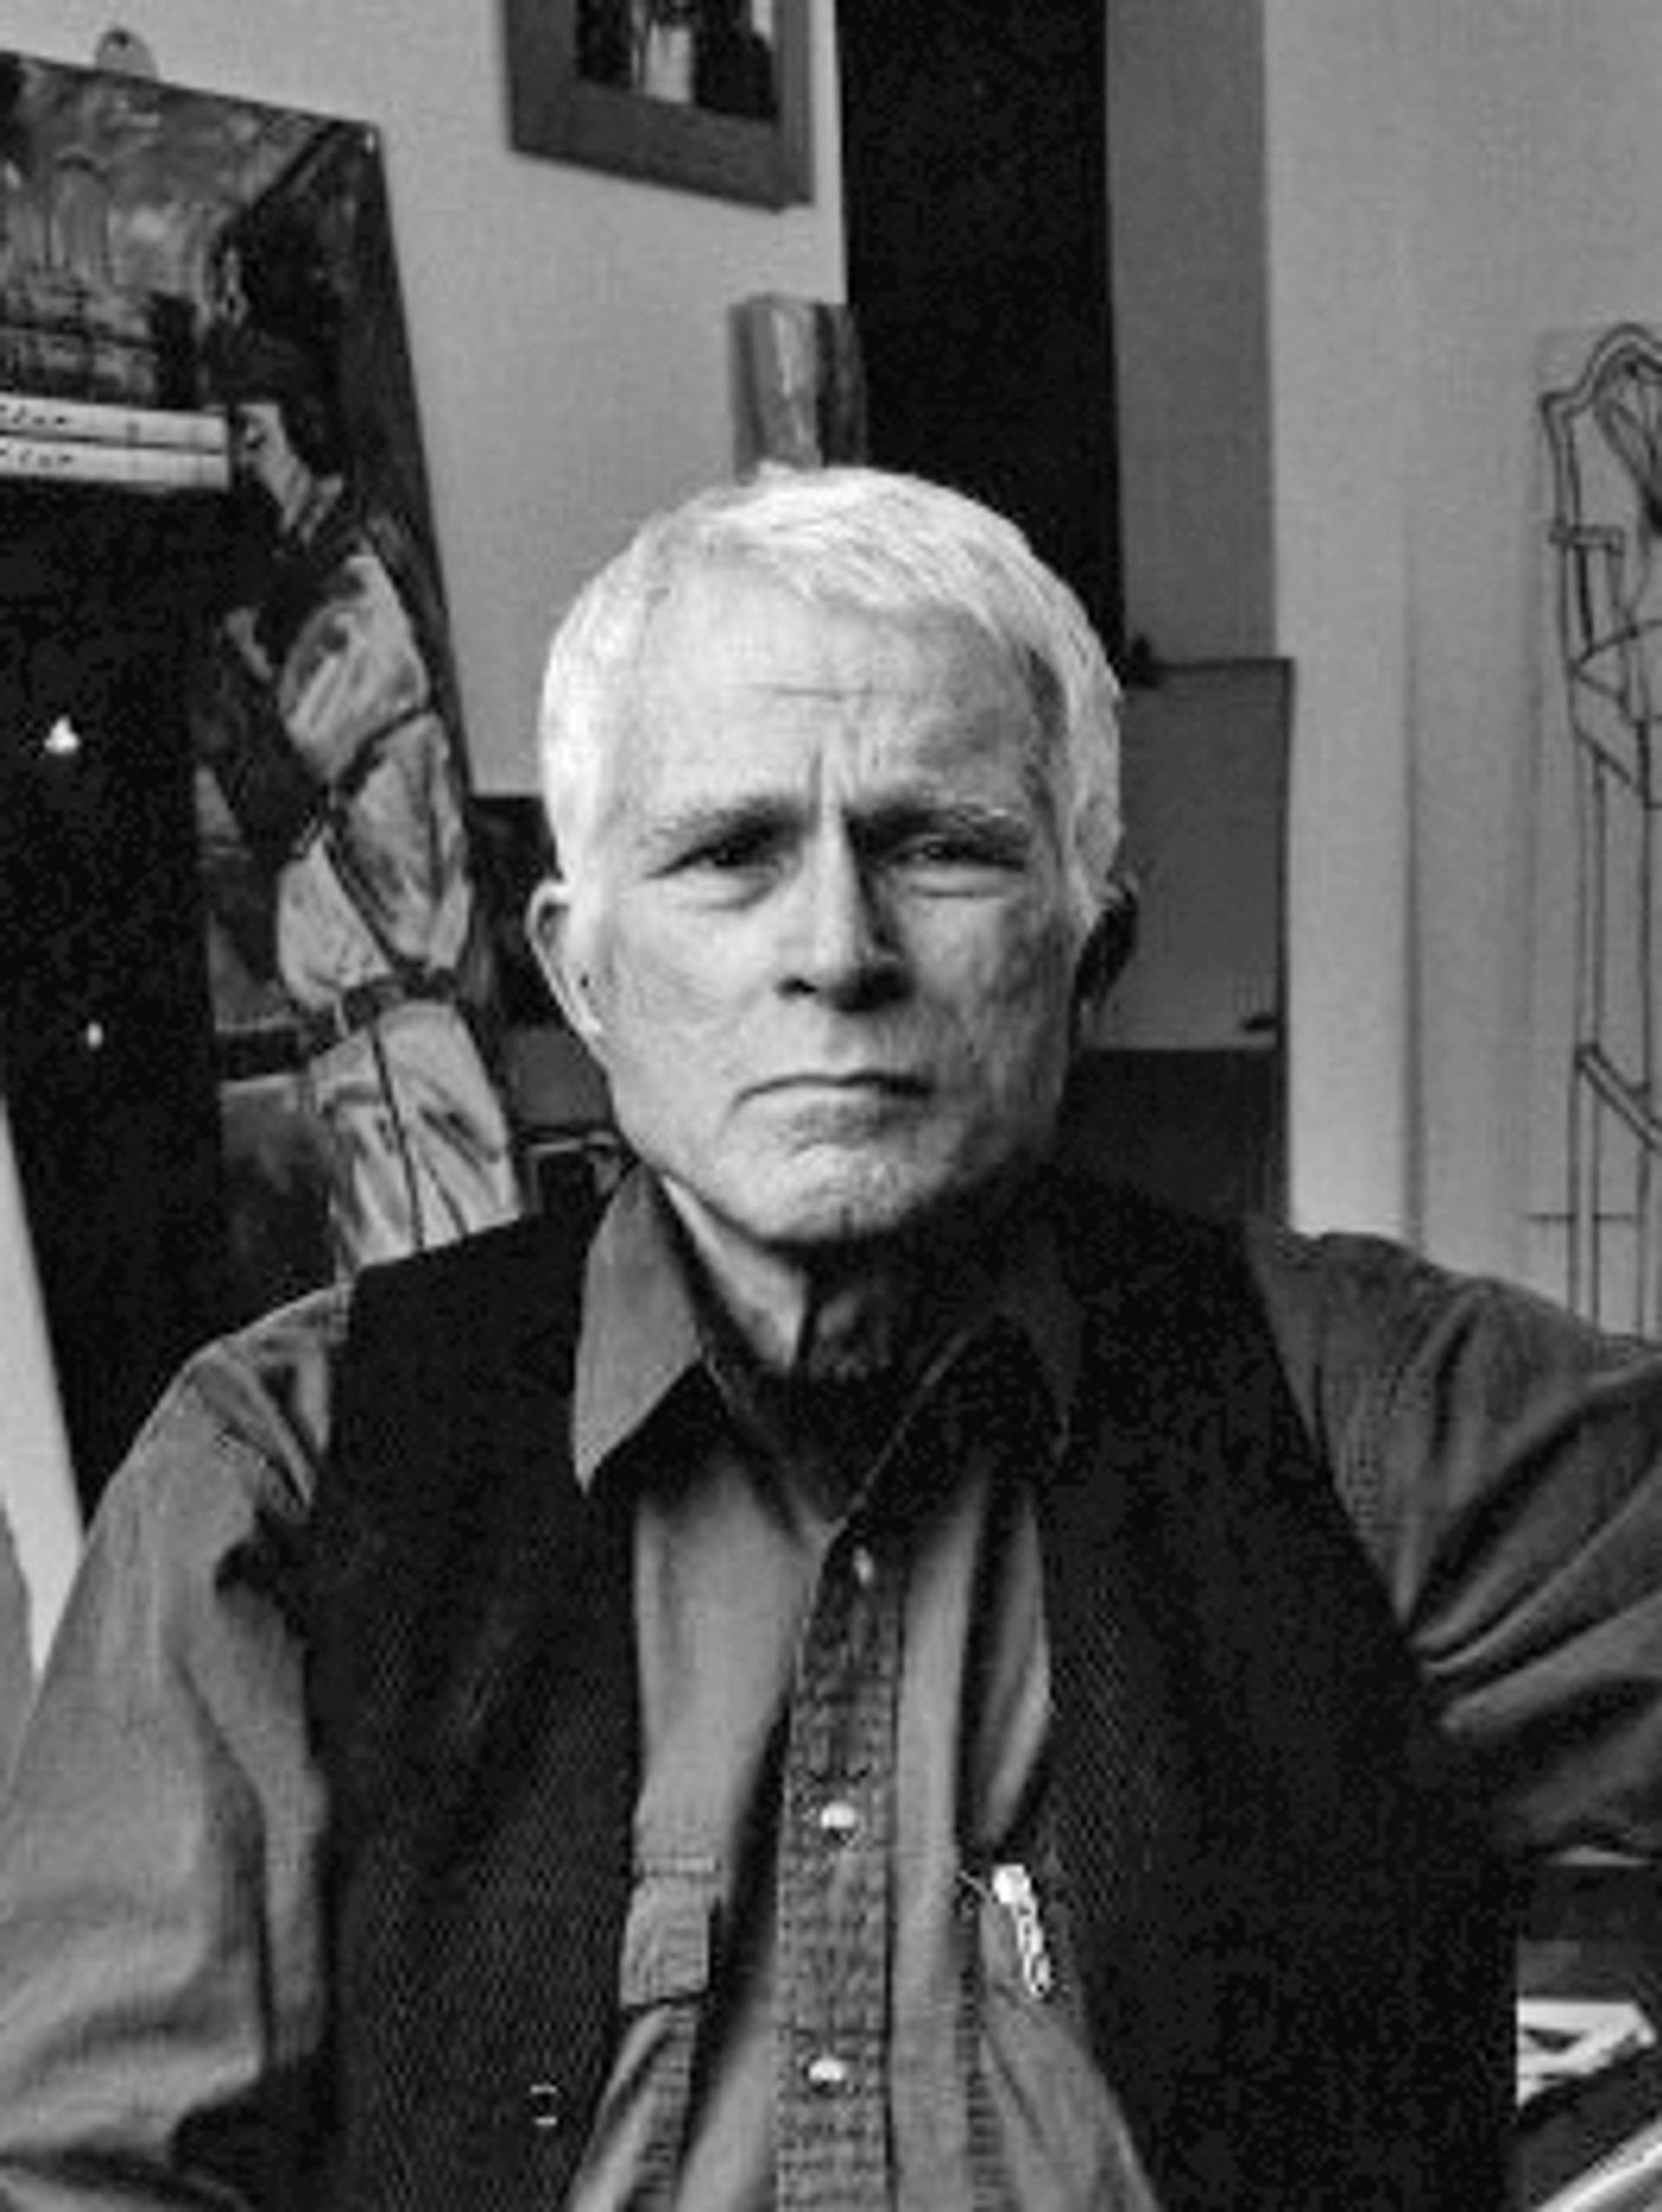 R.B. Kitaj, photographed by Fergus Greer National Portrait Gallery